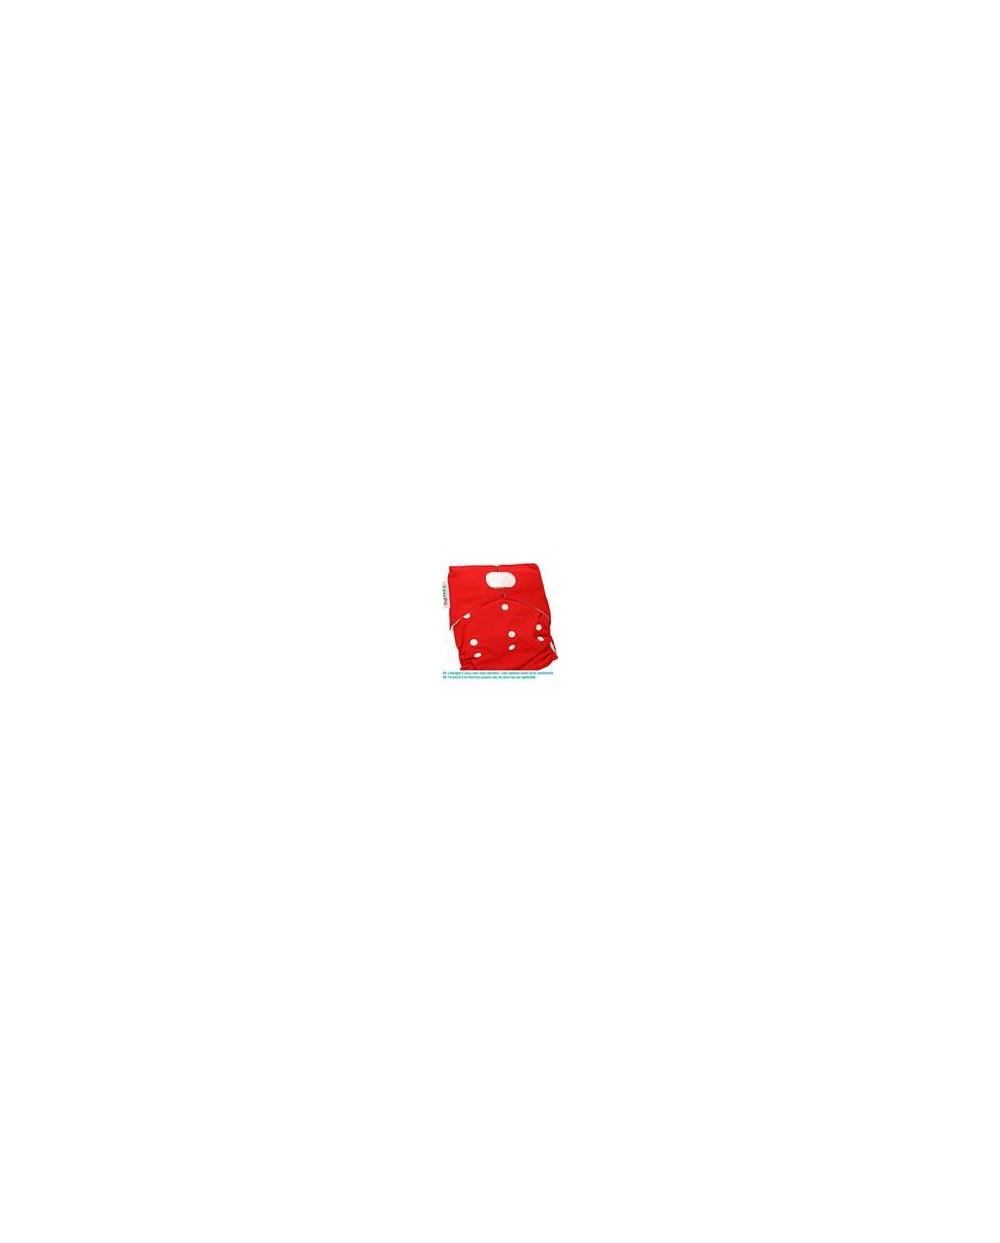 easypu - Pannolino lavabile rosso